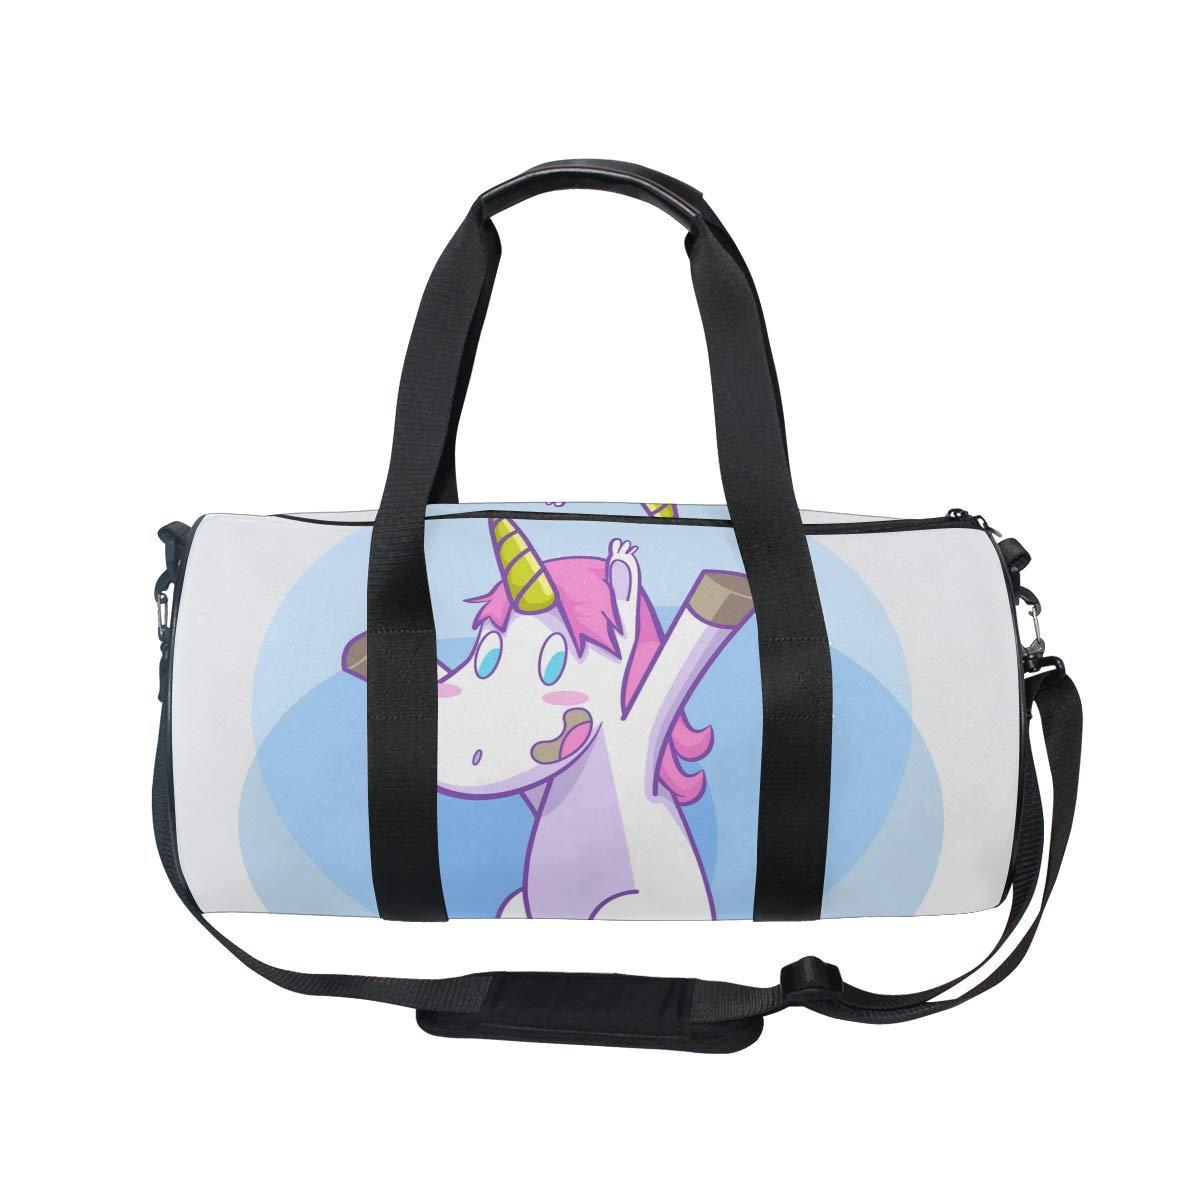 WIHVE Gym Duffel Bag Unicorn Smile Sitting Hooray Sports Lightweight Canvas Travel Luggage Bag